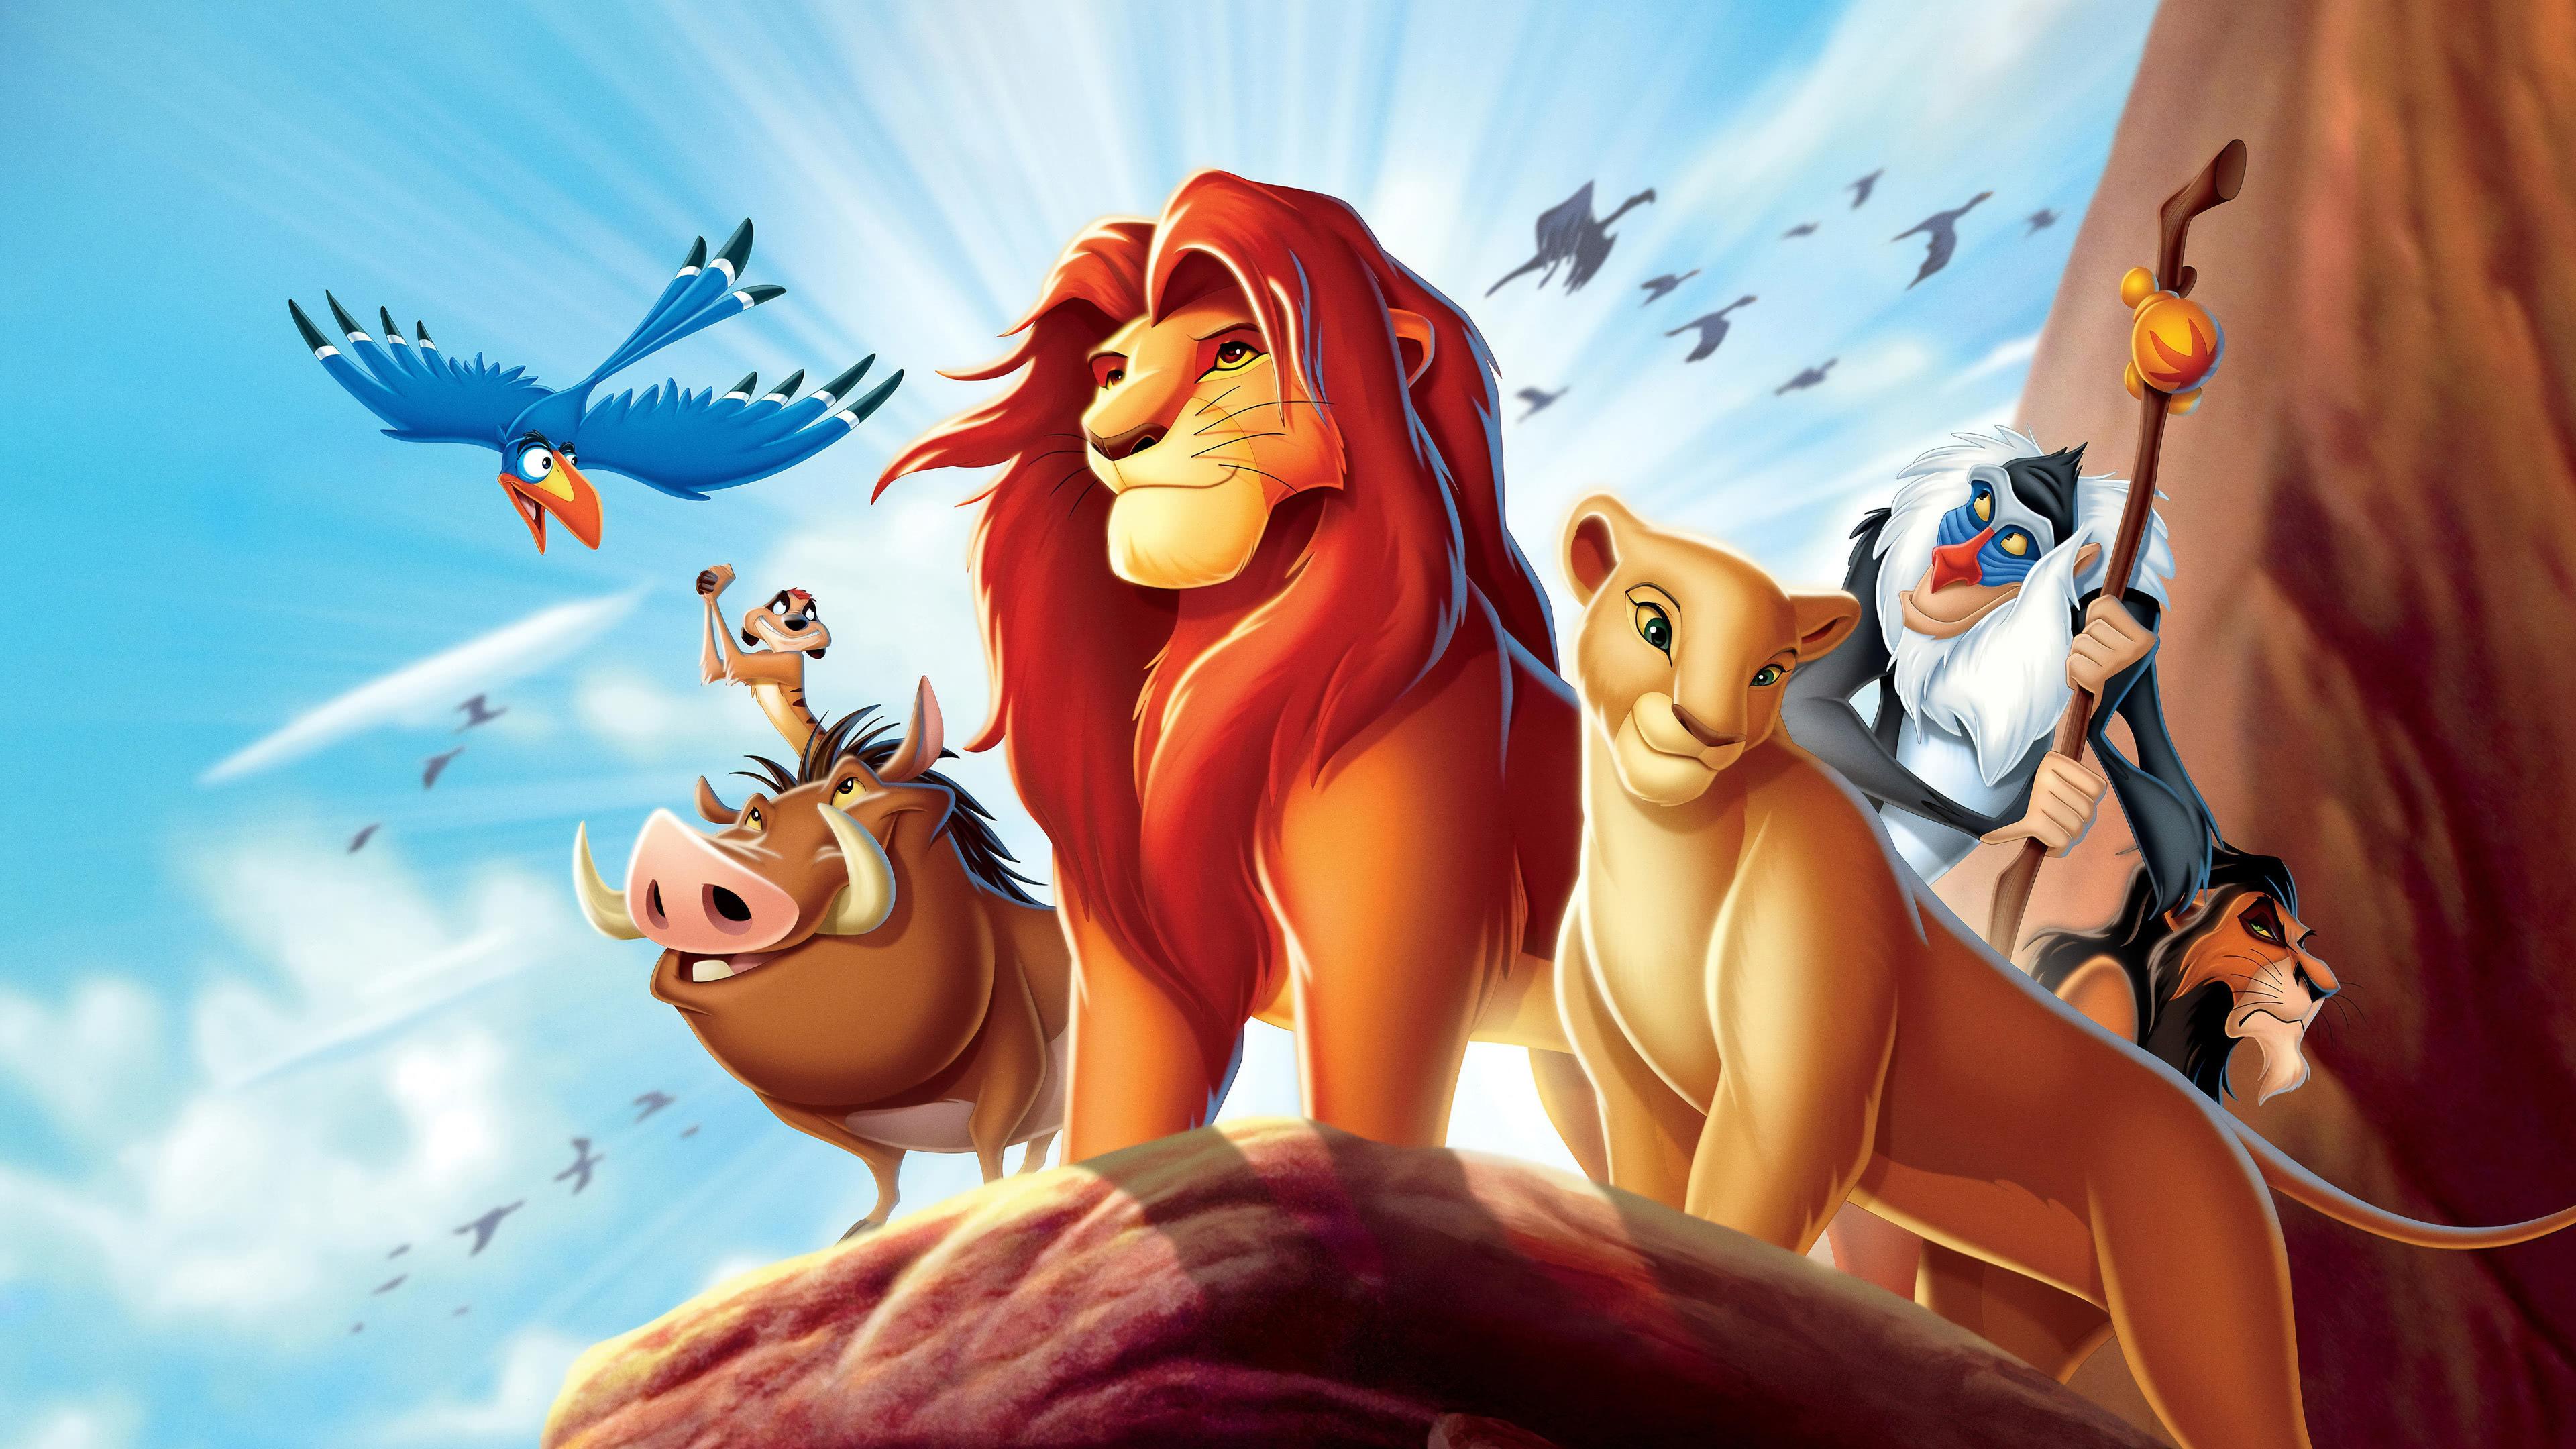 The Lion King Simba Nala Timon And Pumbaa Uhd 4k Wallpaper Pixelz